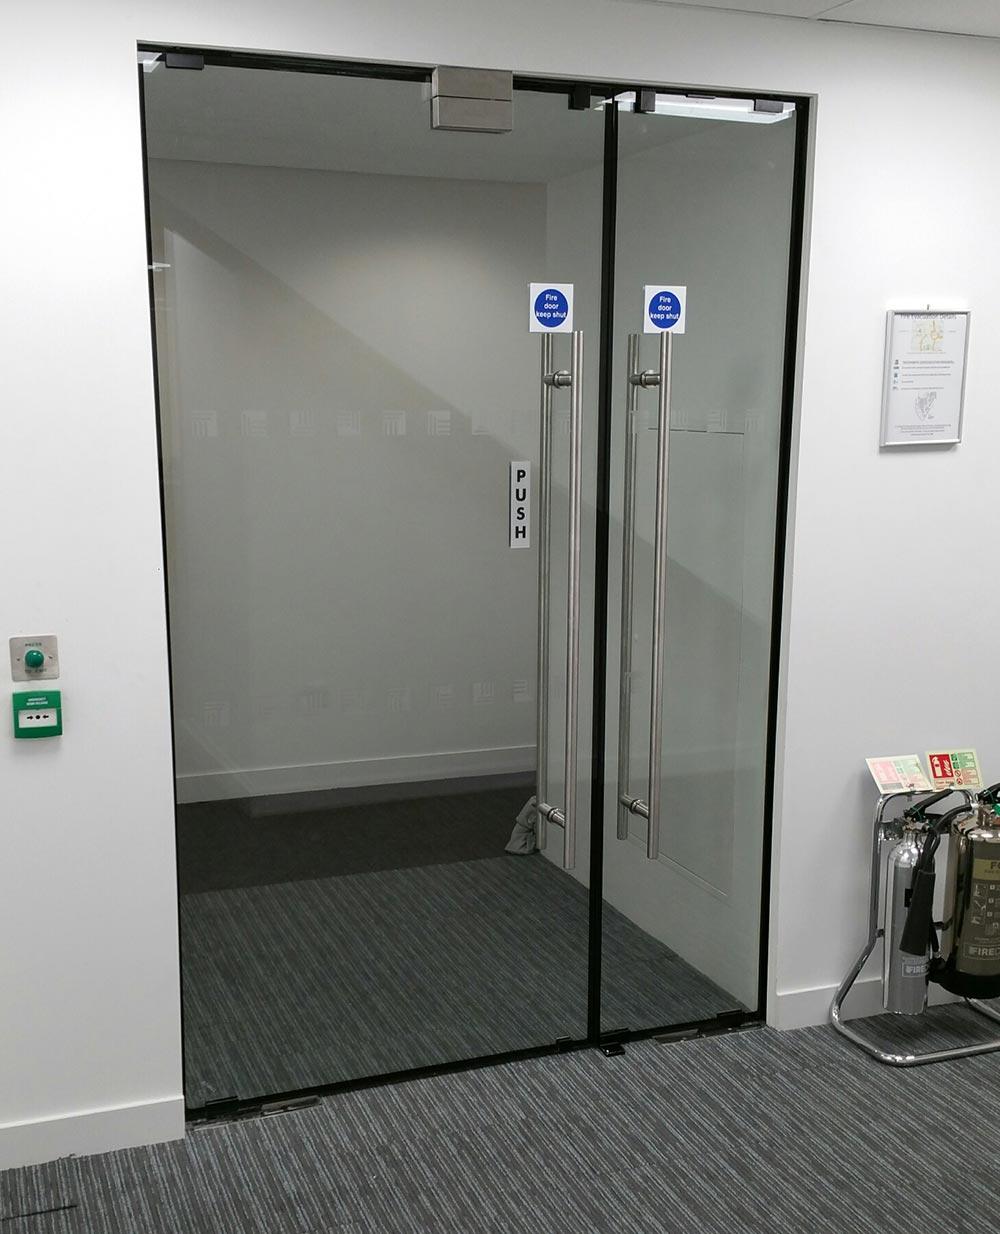 Lunax fire doors